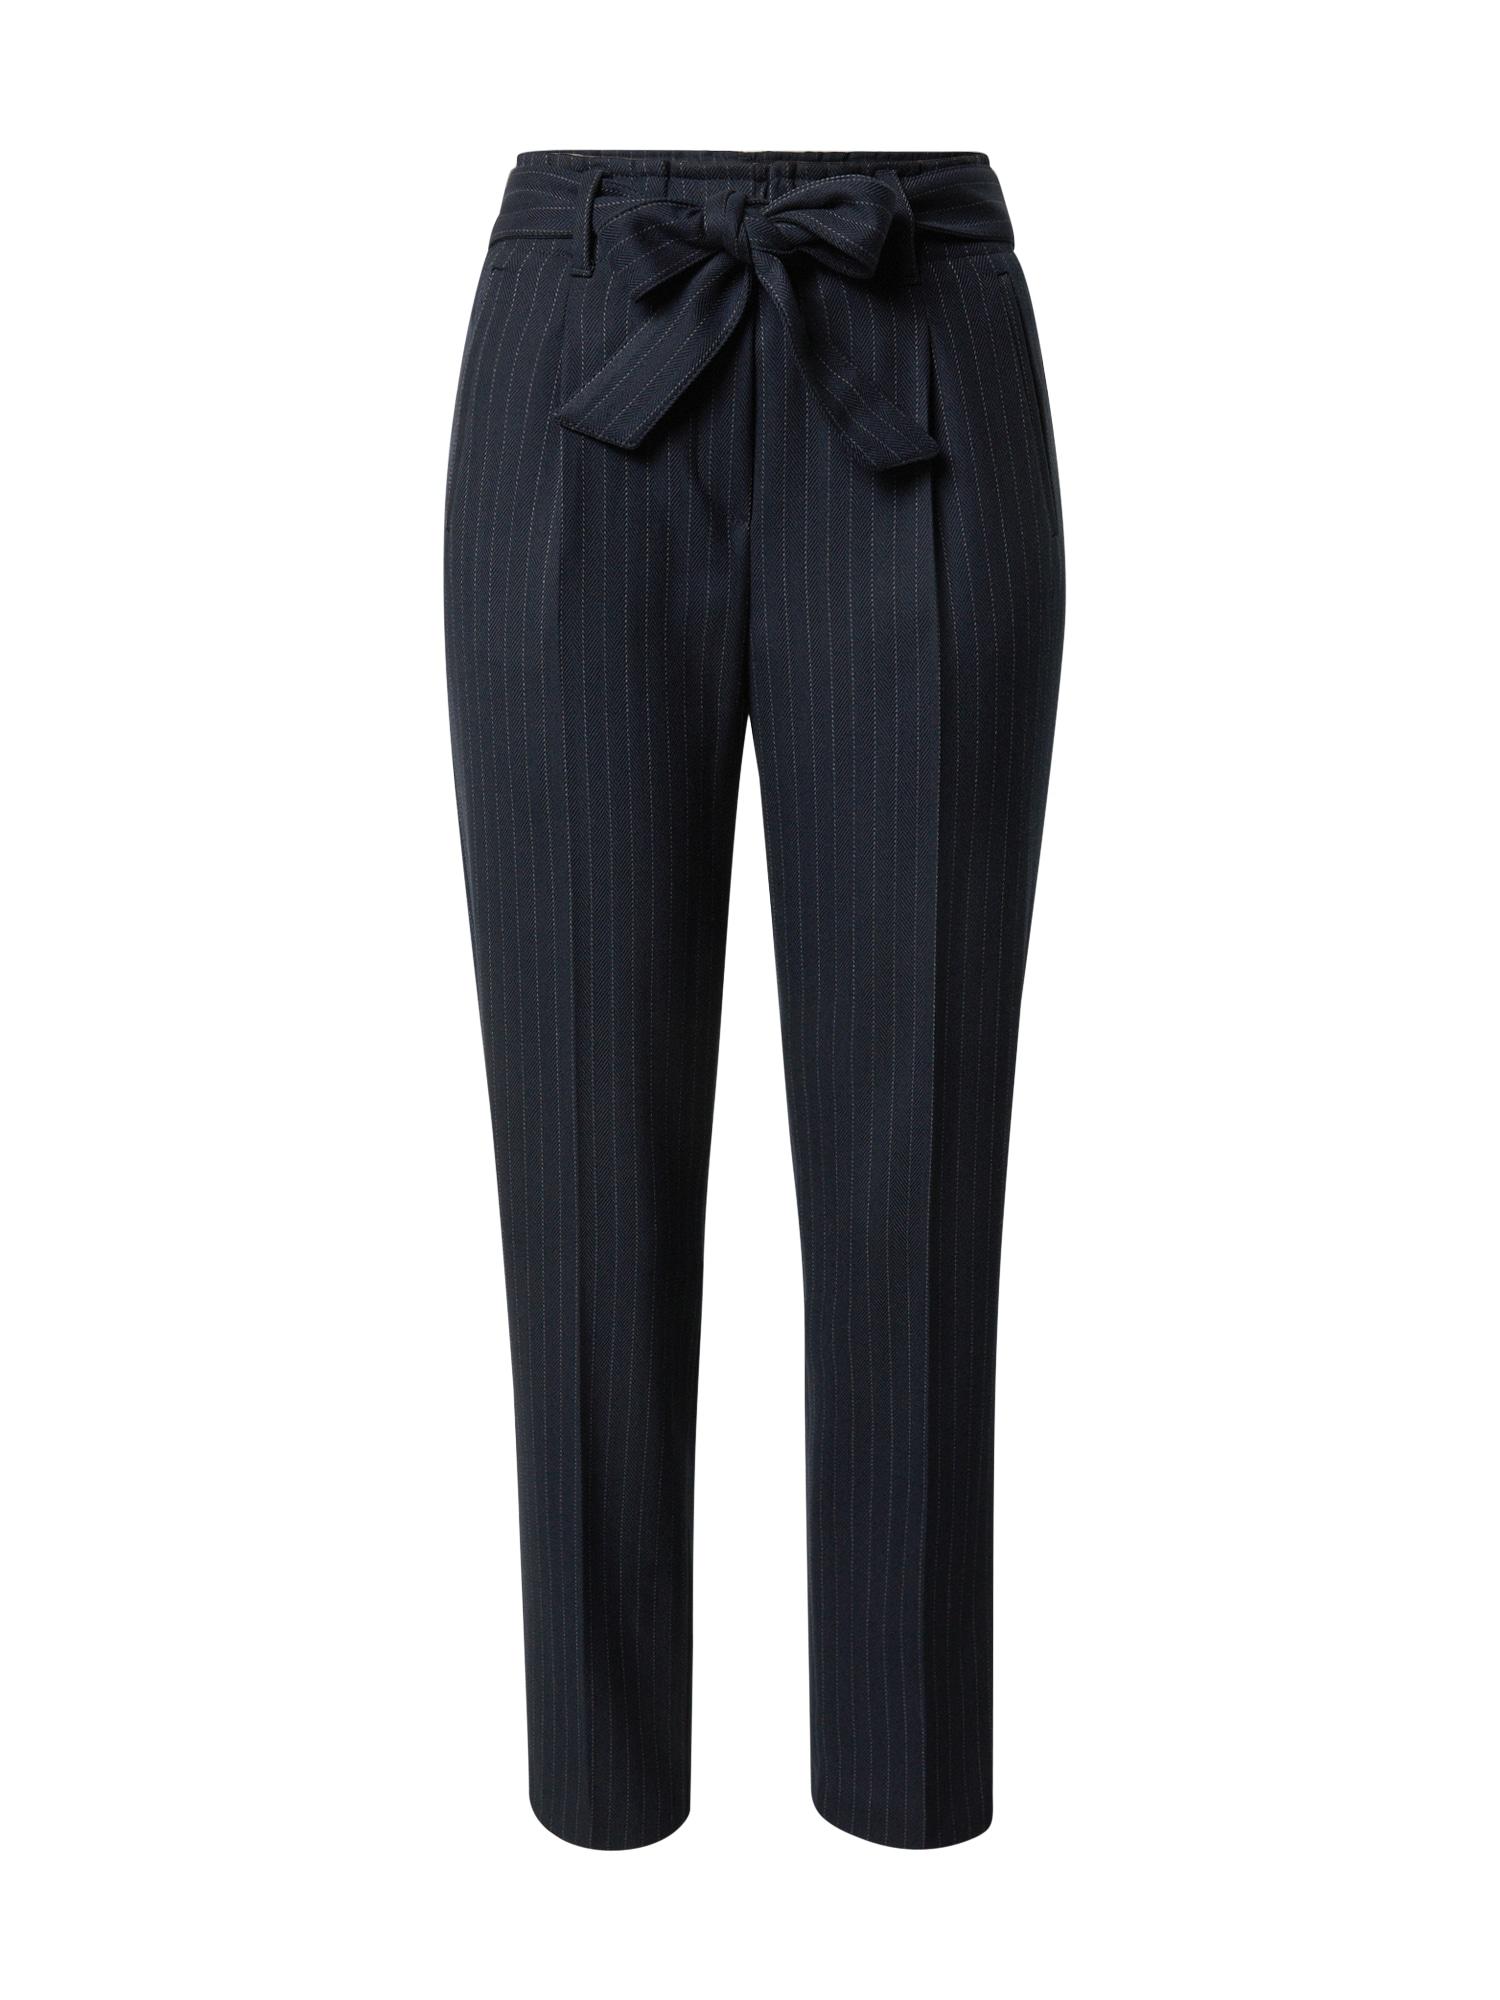 BRAX Klostuotos kelnės 'MILLA S' balta / tamsiai mėlyna